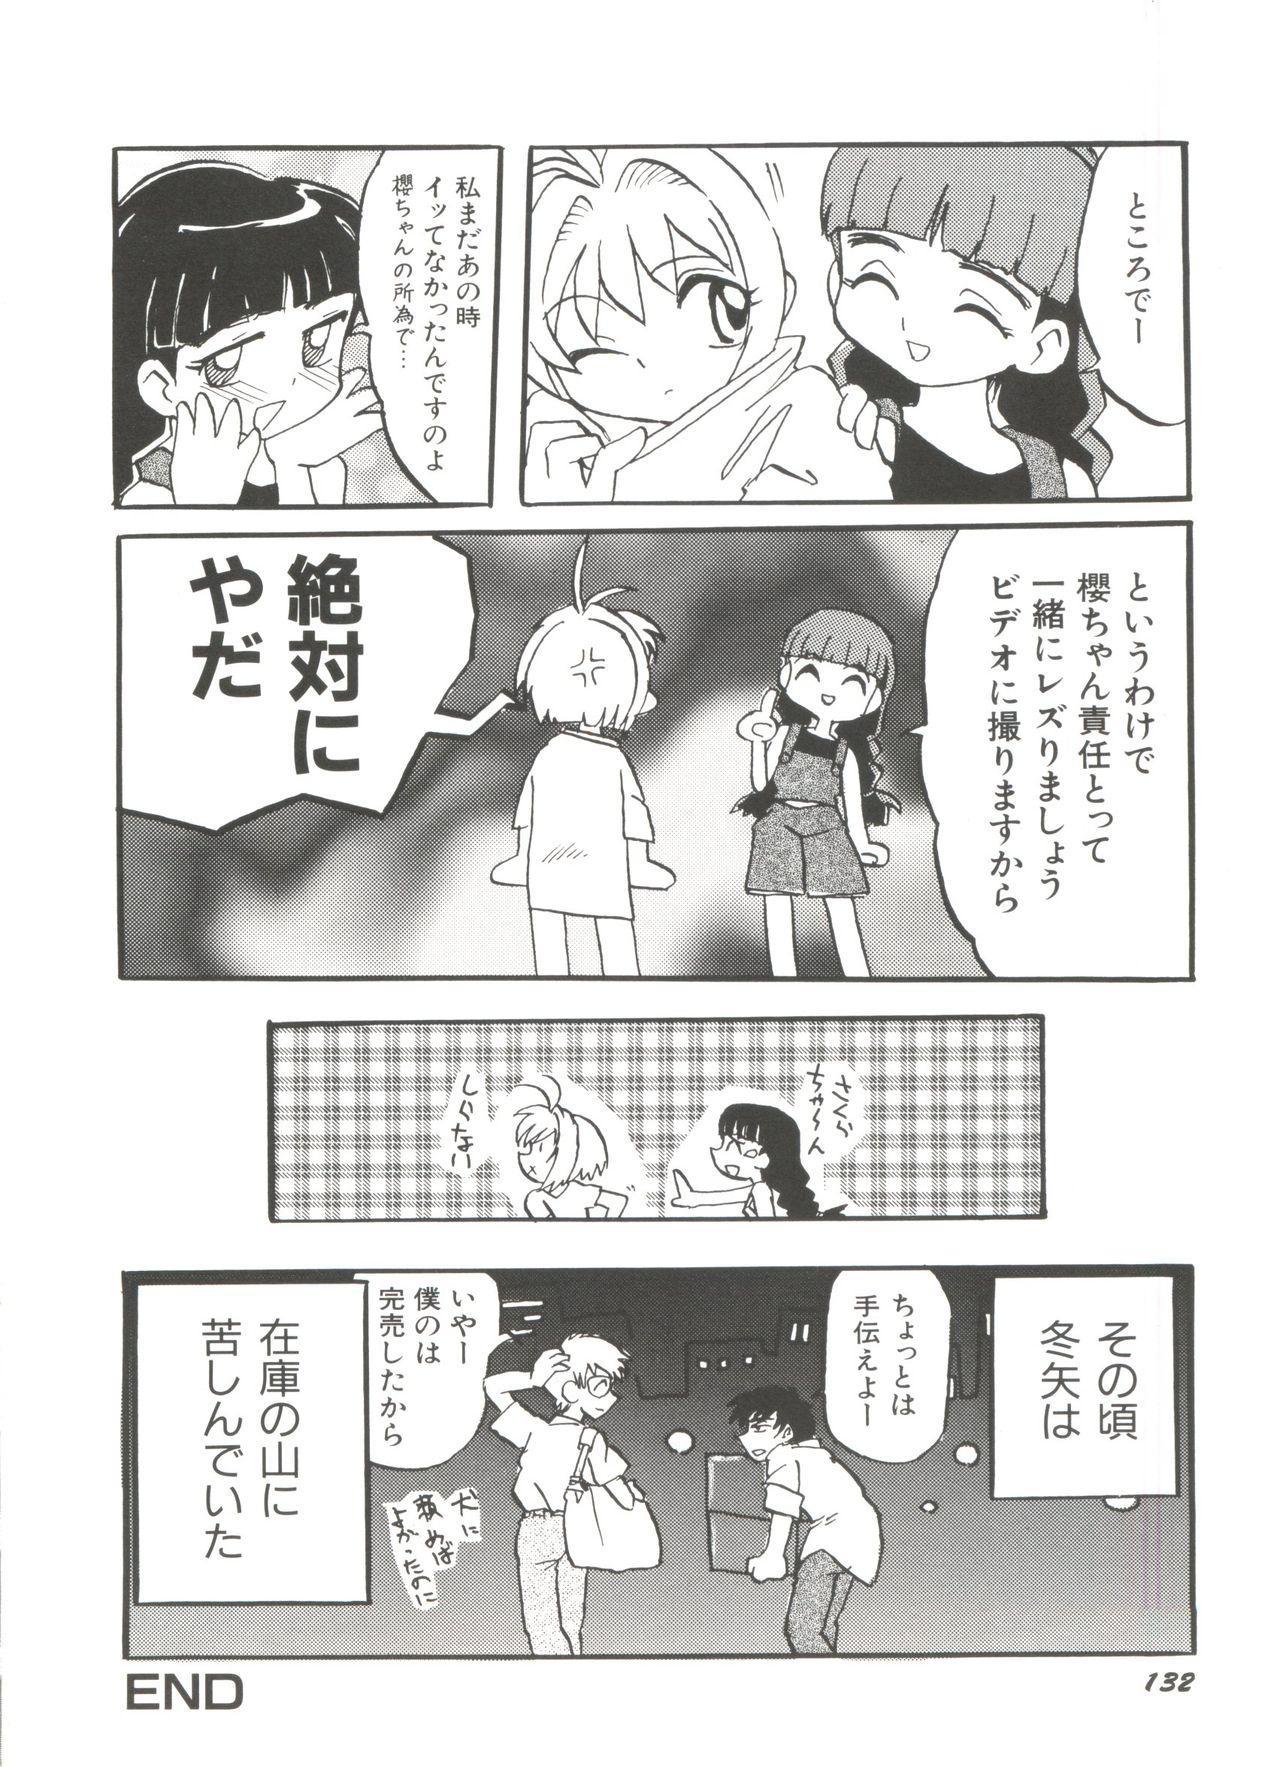 [Anthology] Denei Tamatebako 8 - Utakata no Tenshi-tachi II (Various) 133